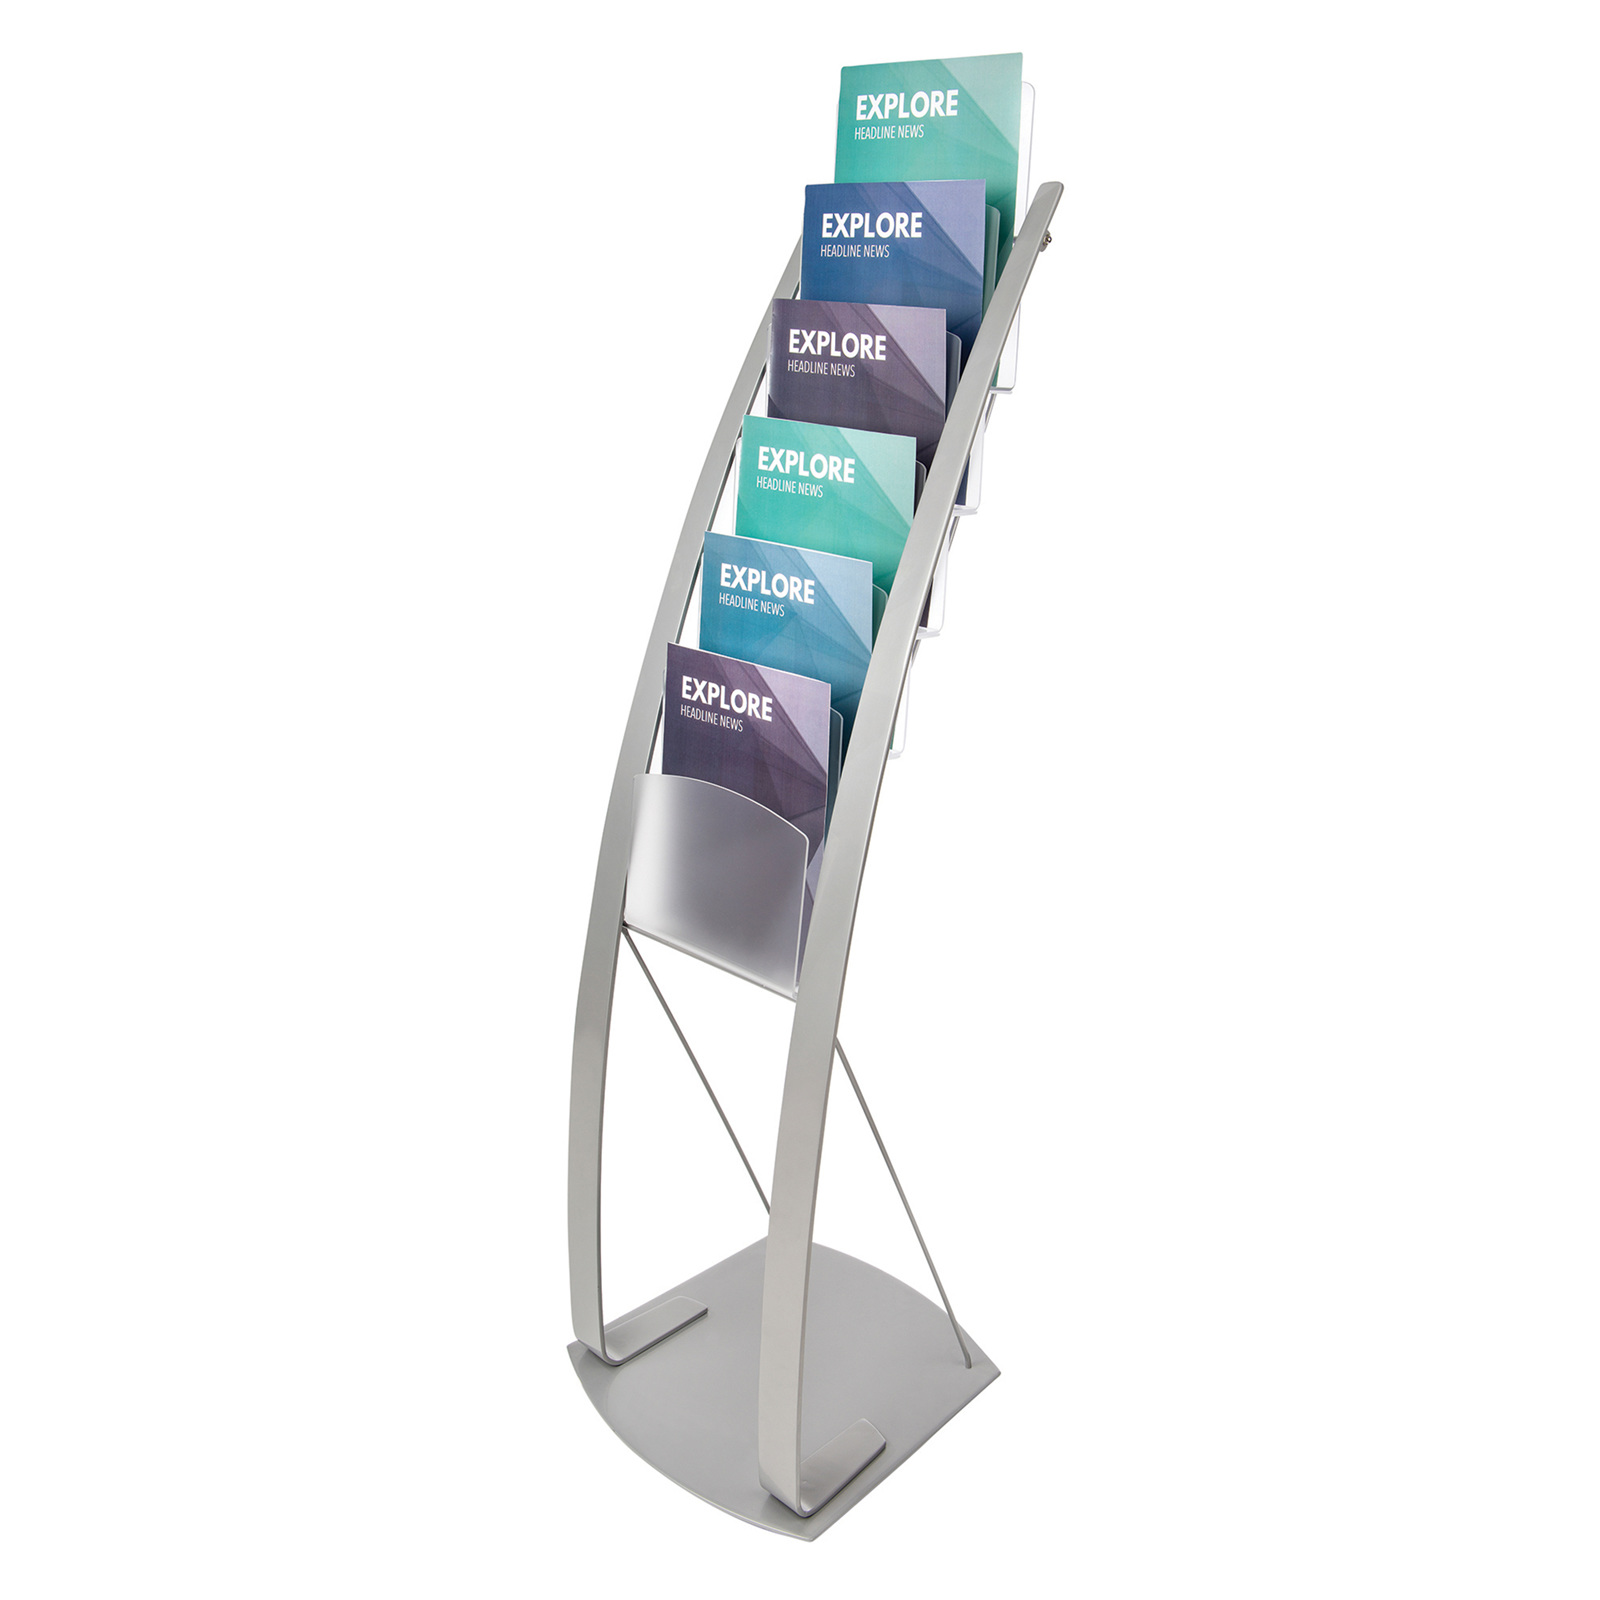 Exhibition Display Stands Nz : Free standing brochure holder magazine stand wellington nz